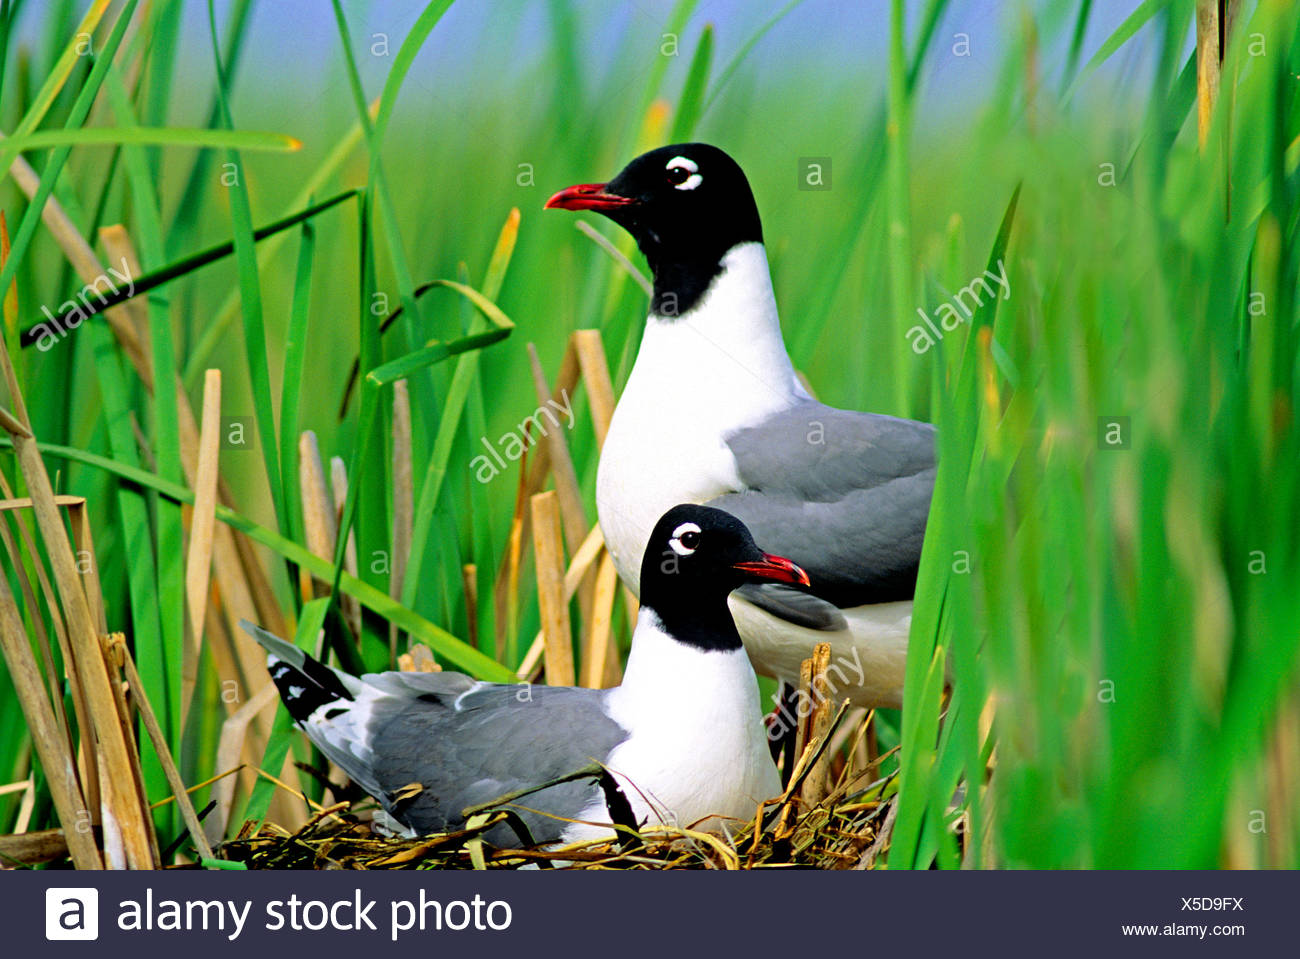 Nesting Franklin's gulls (Larus pipixcan), Alberta, Canada. - Stock Image